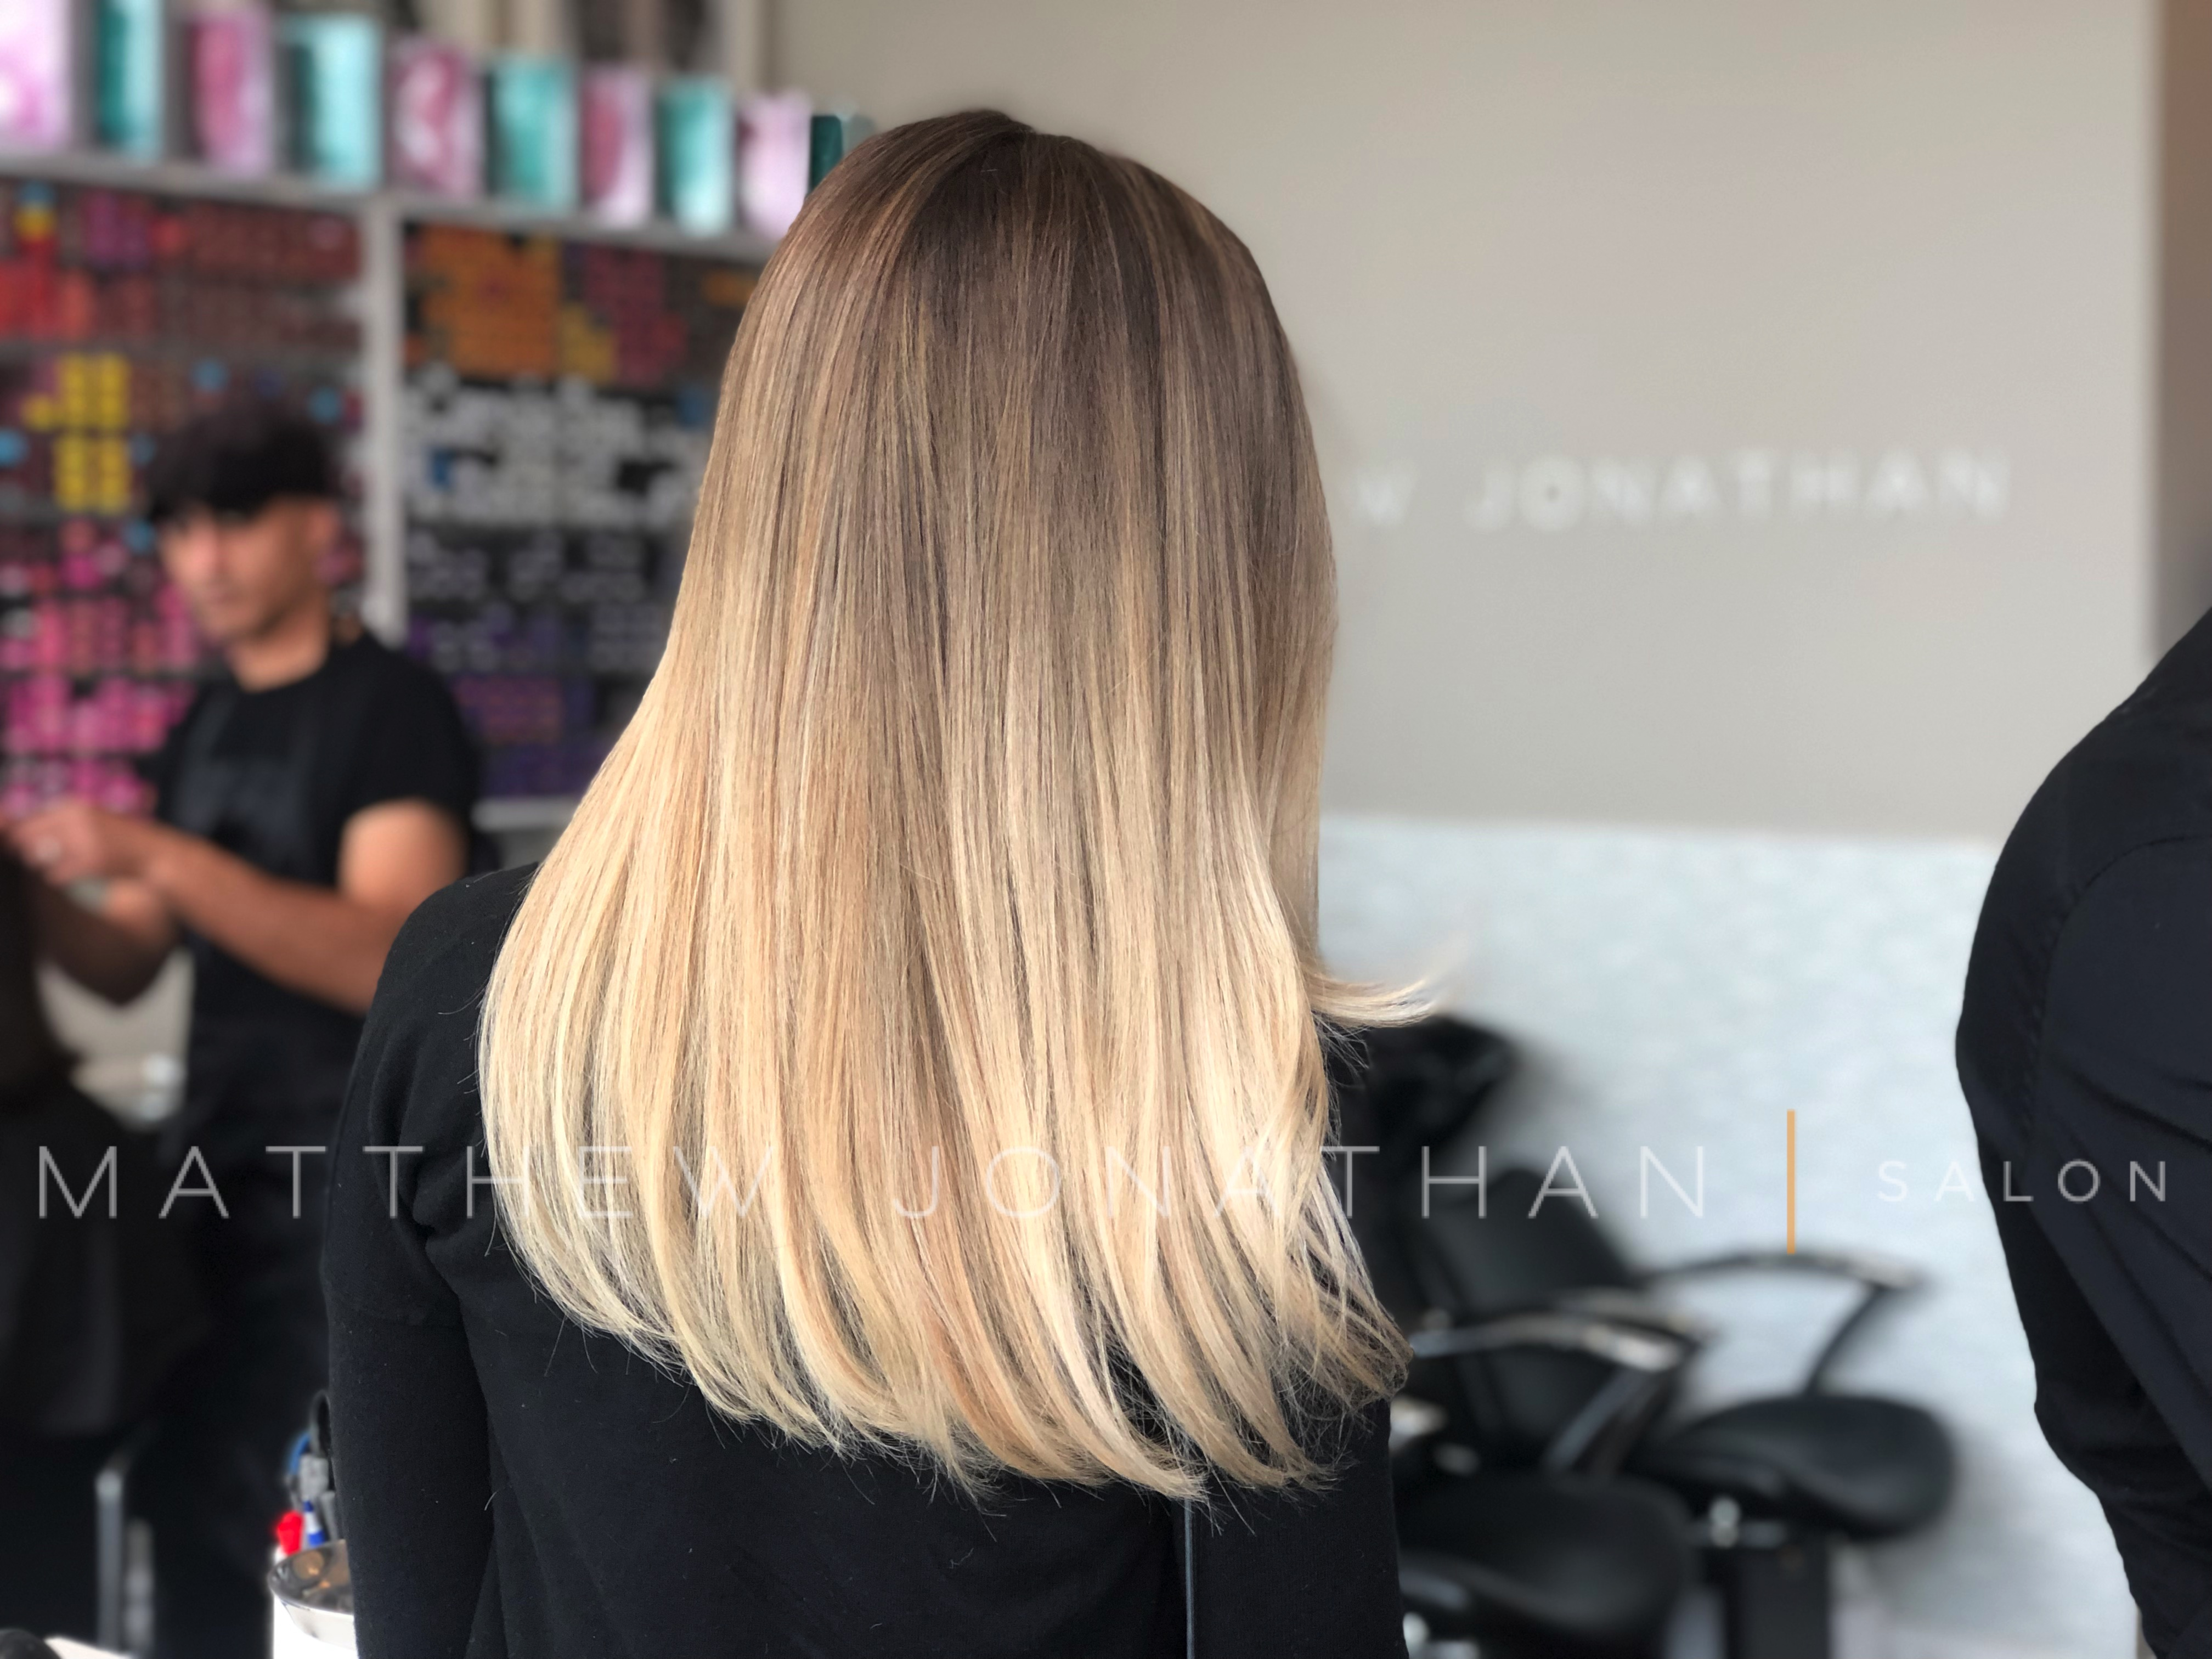 #balayageoakville #balayageburlington #balayagetoronto #sombrehair #sombre #balayage #babylights #colormelt #babylight #ombrehair #balayagehighlights #silverbalayage #blondebalayage #balayageombre#Olaplex #tortoiseshell #flamboyage #Balayage #Sombre #Ombre #matthewjonathansalon #OakvilleBalayage#Salon#Torontobalayage#blondehair#wavyhair #matthewjonathan#silverhair #babylightsbalayage